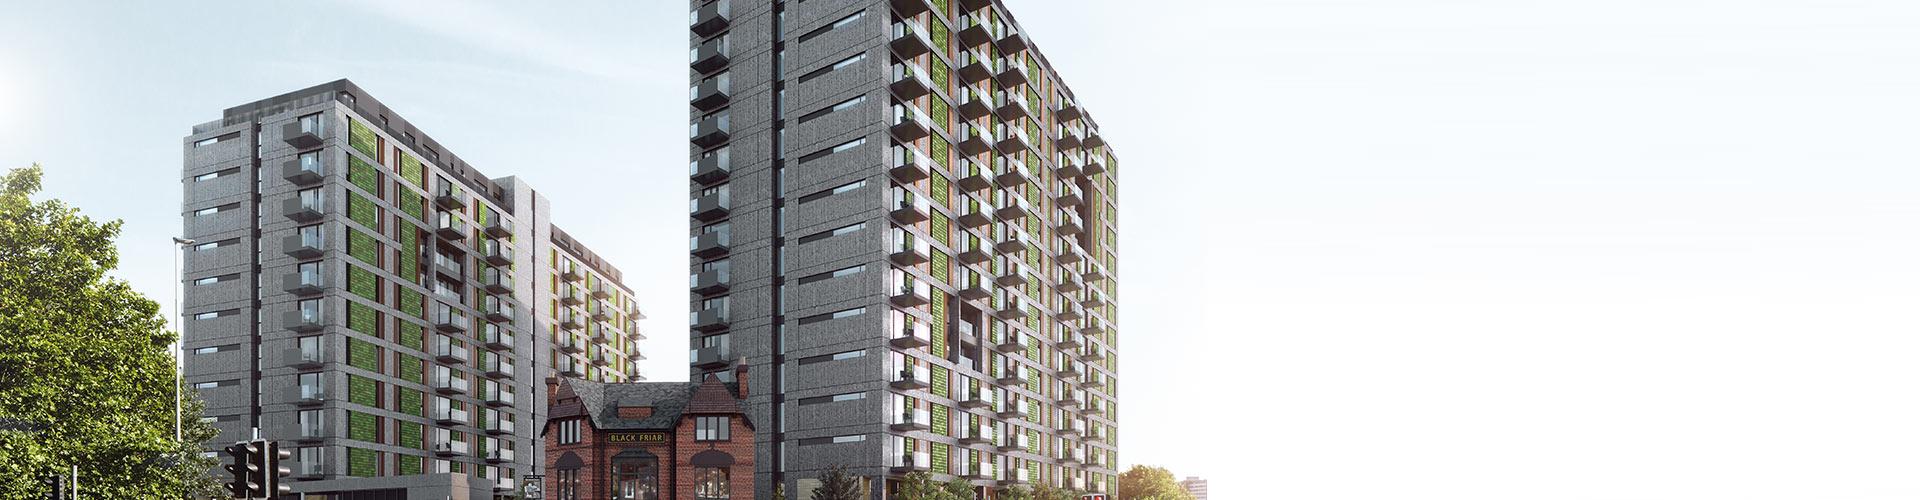 Blackfriars Apartments, Manchester Banner